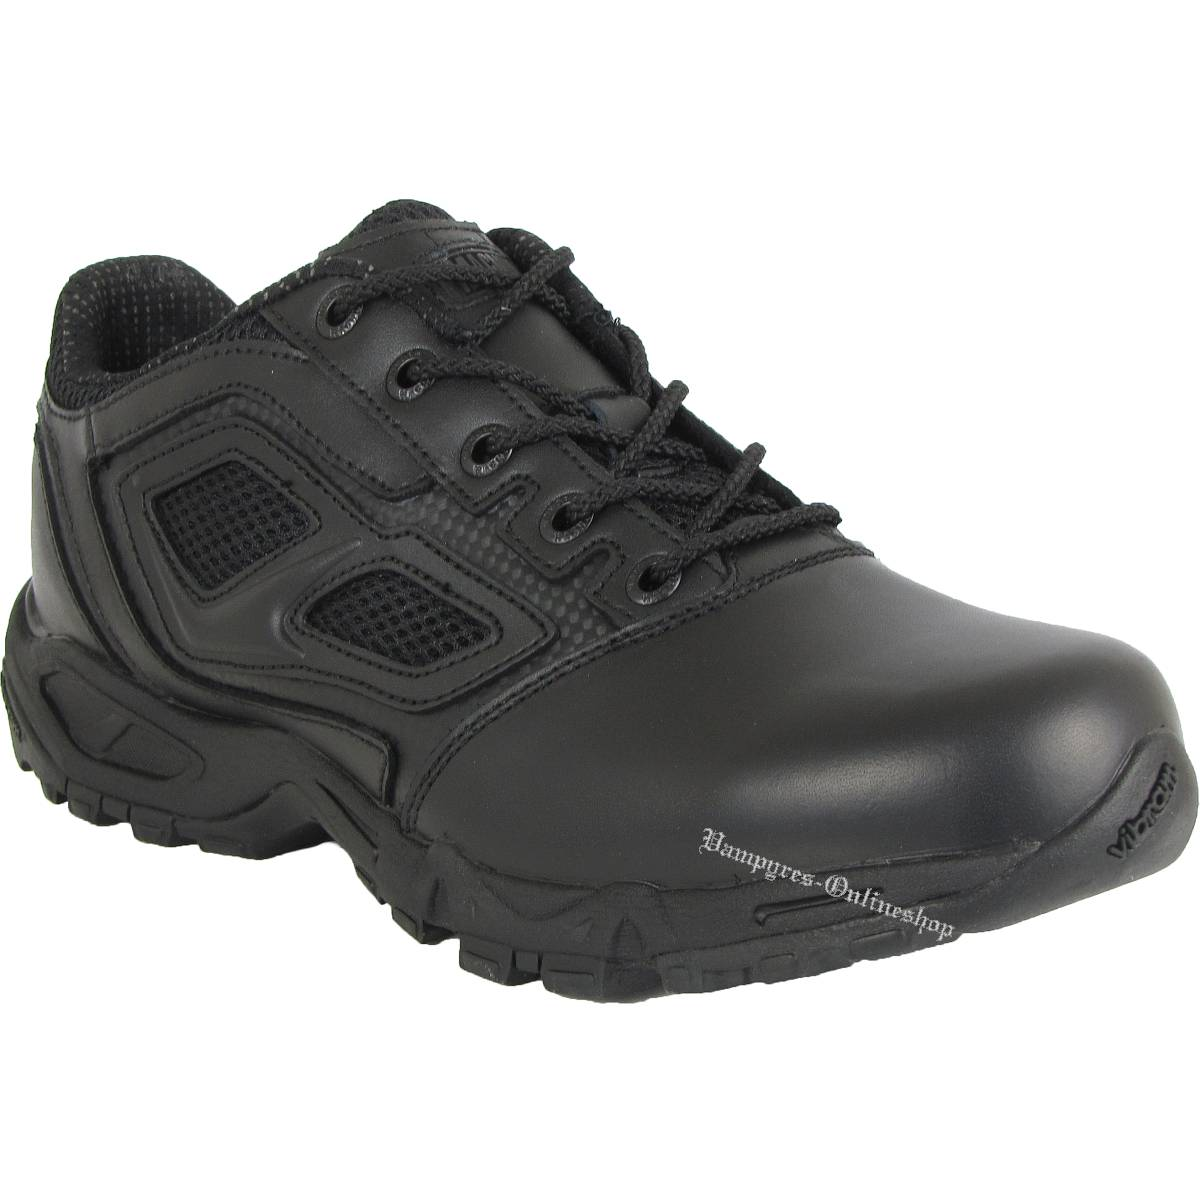 Magnum (Hi-Tec) Elite Spider 3.0 Schwarz Schuhe